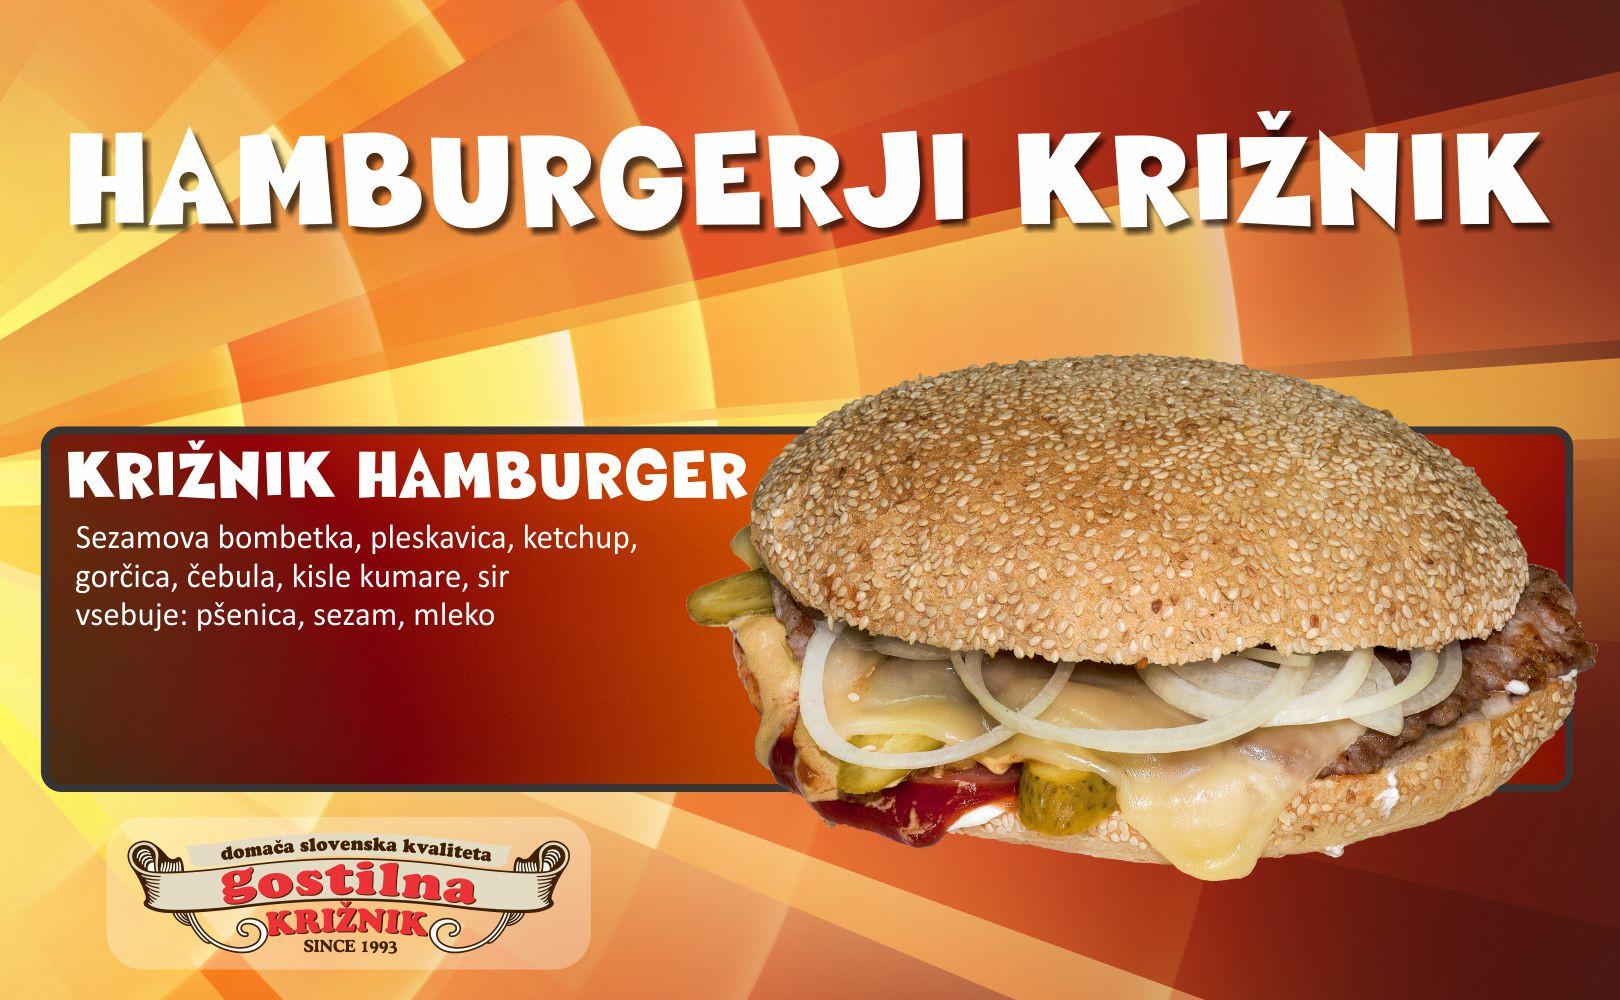 Križnik hamburger